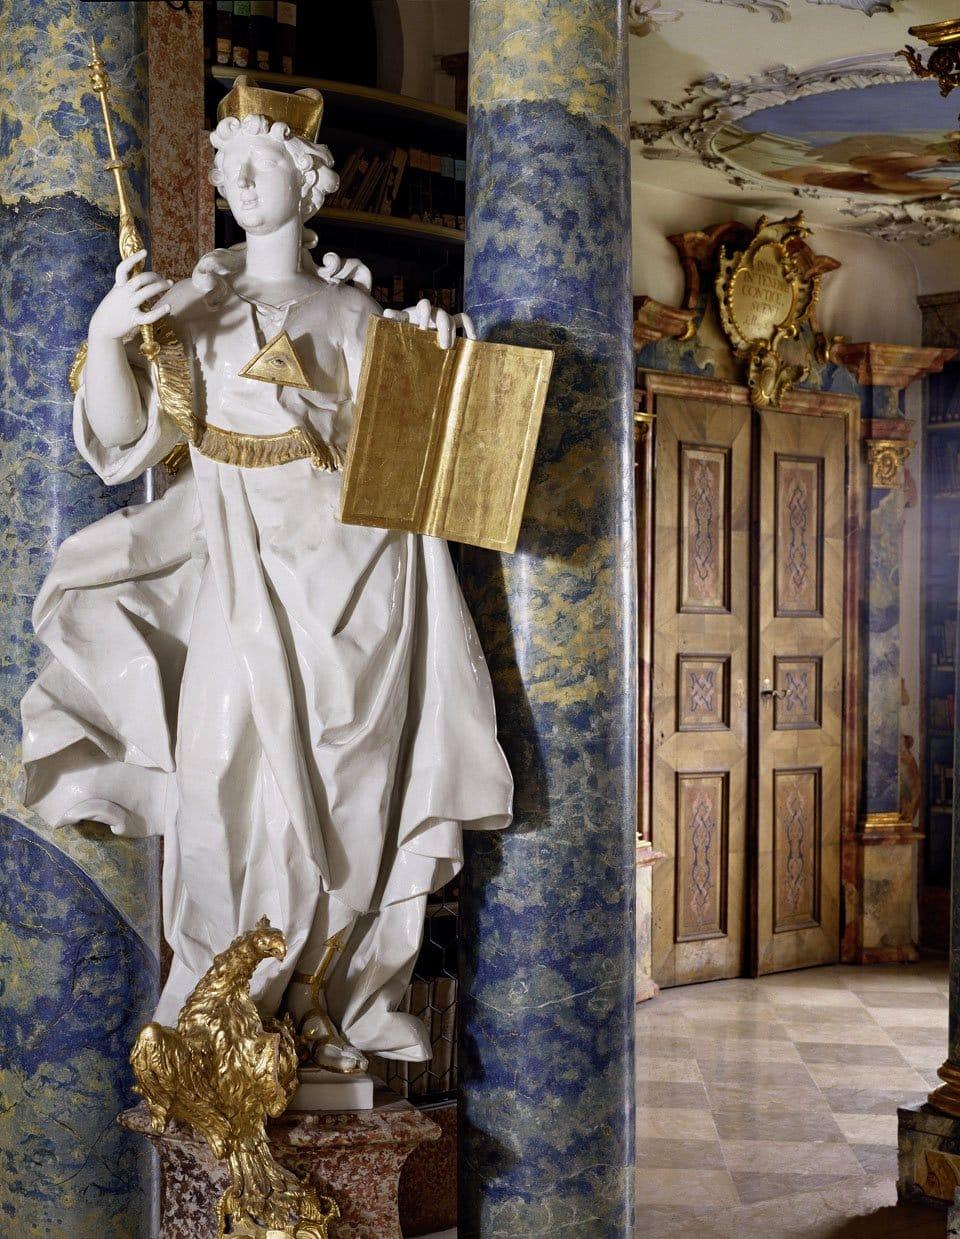 The Klosterbibliothek Wiblingen